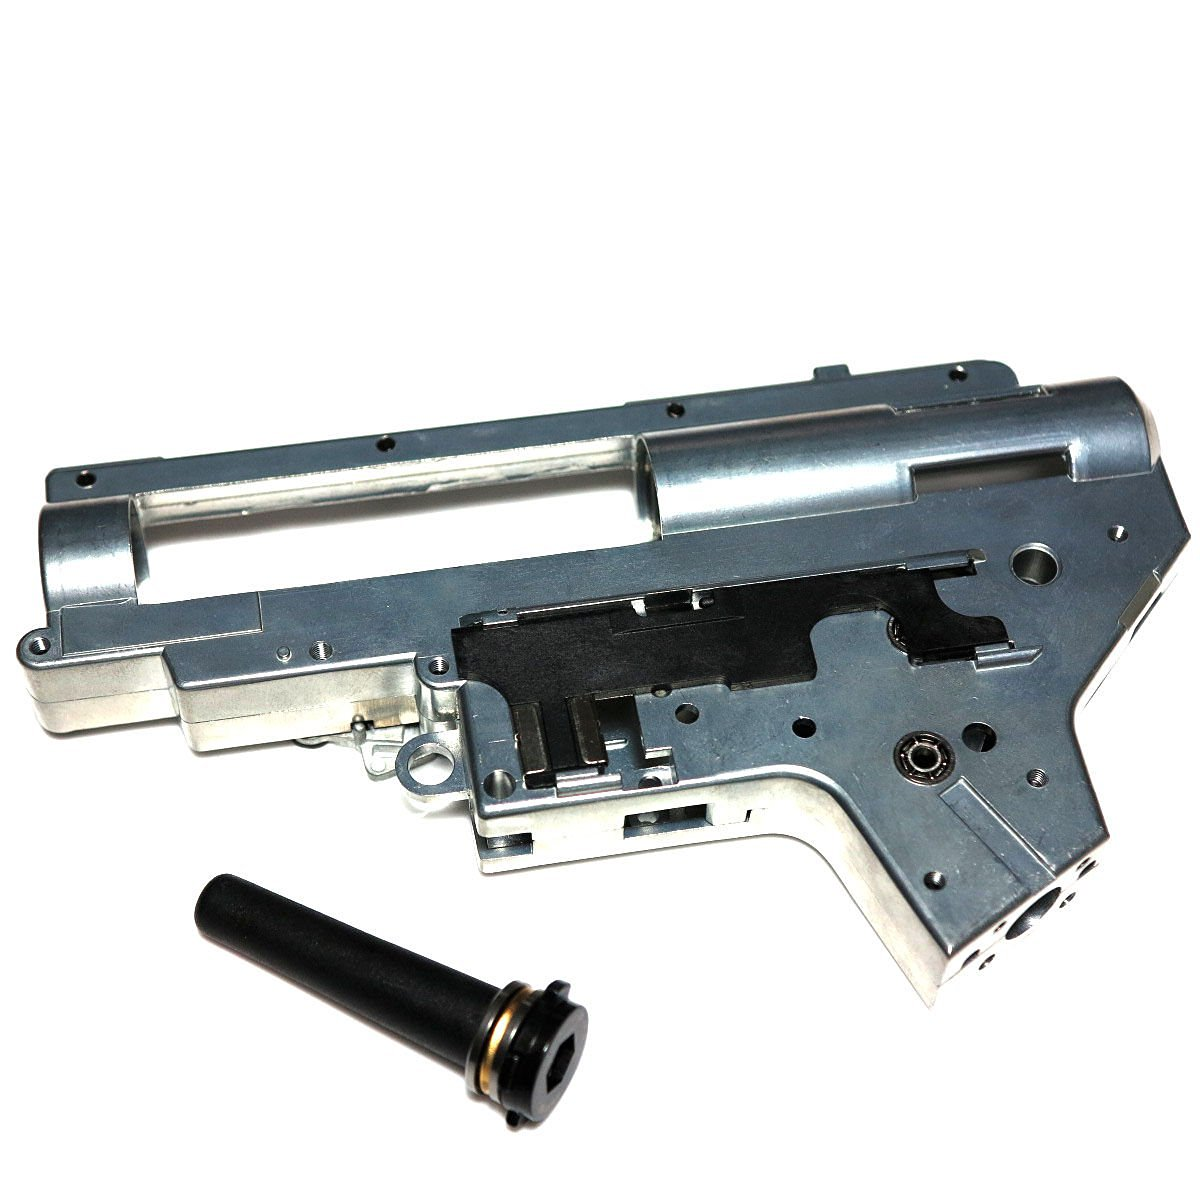 AEG Airsoft Wargame Shooting Gear APS APS-22 ASR 8mm Bearing Mecha Box Shell